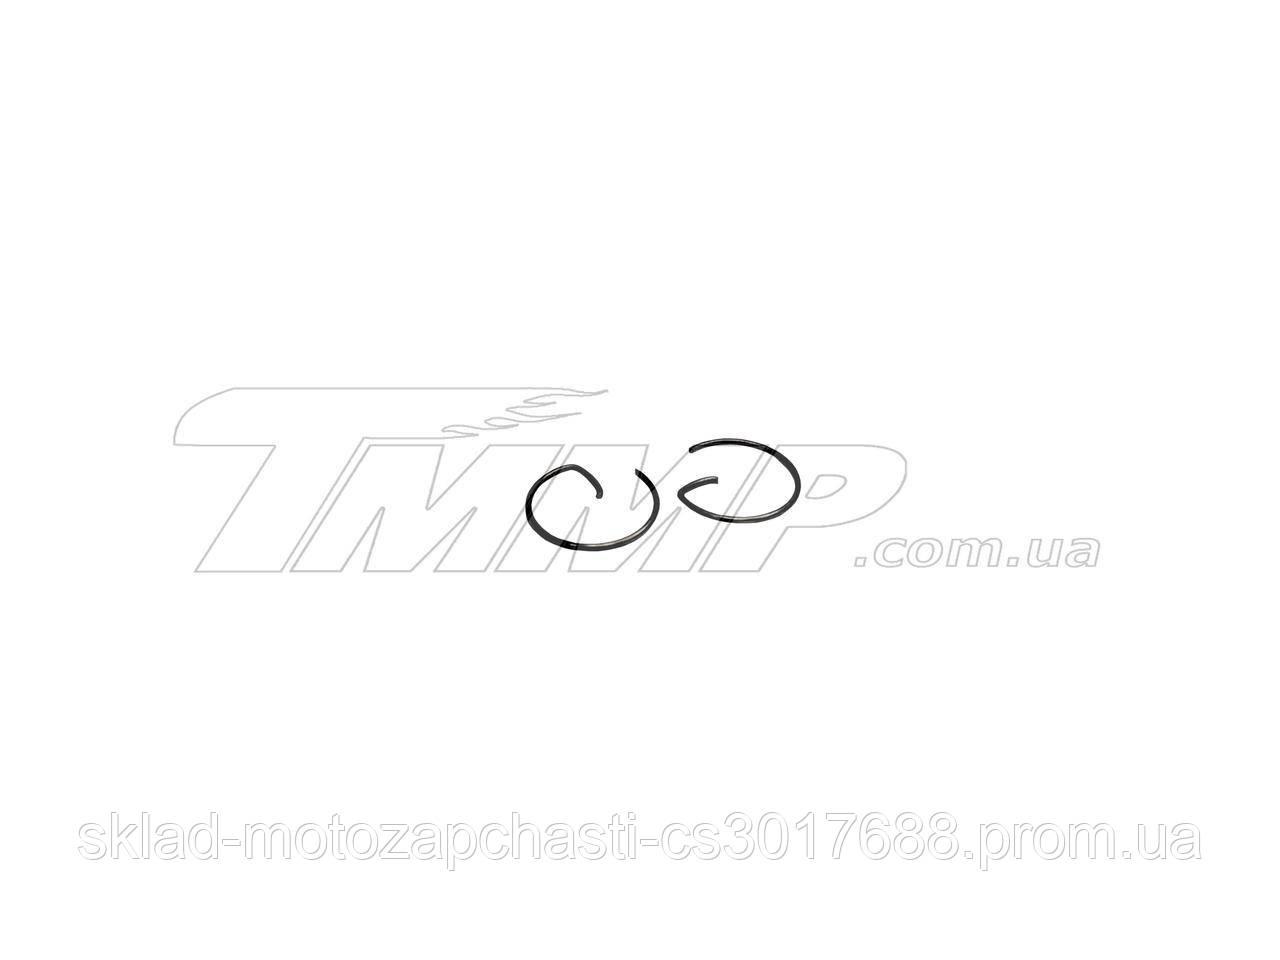 Стопорные кольца 168F (комплект) Артикул: S-5304